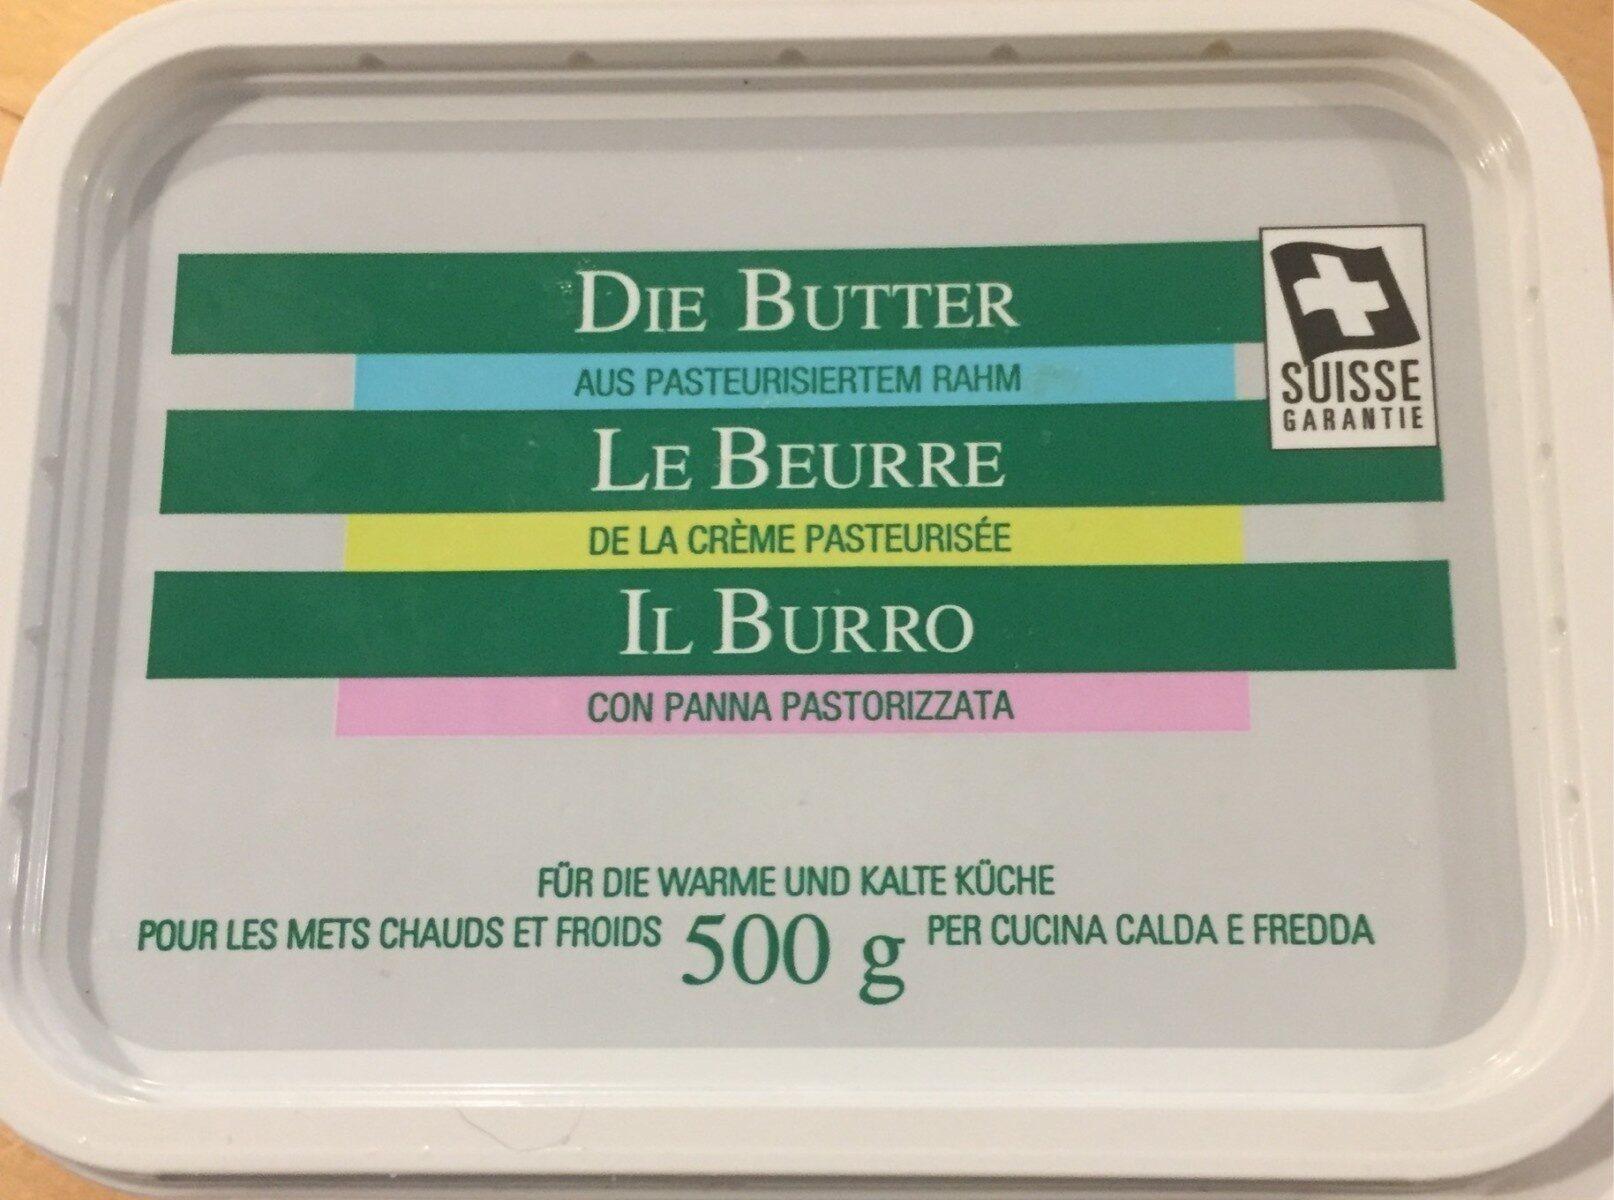 Le beurre - Product - fr